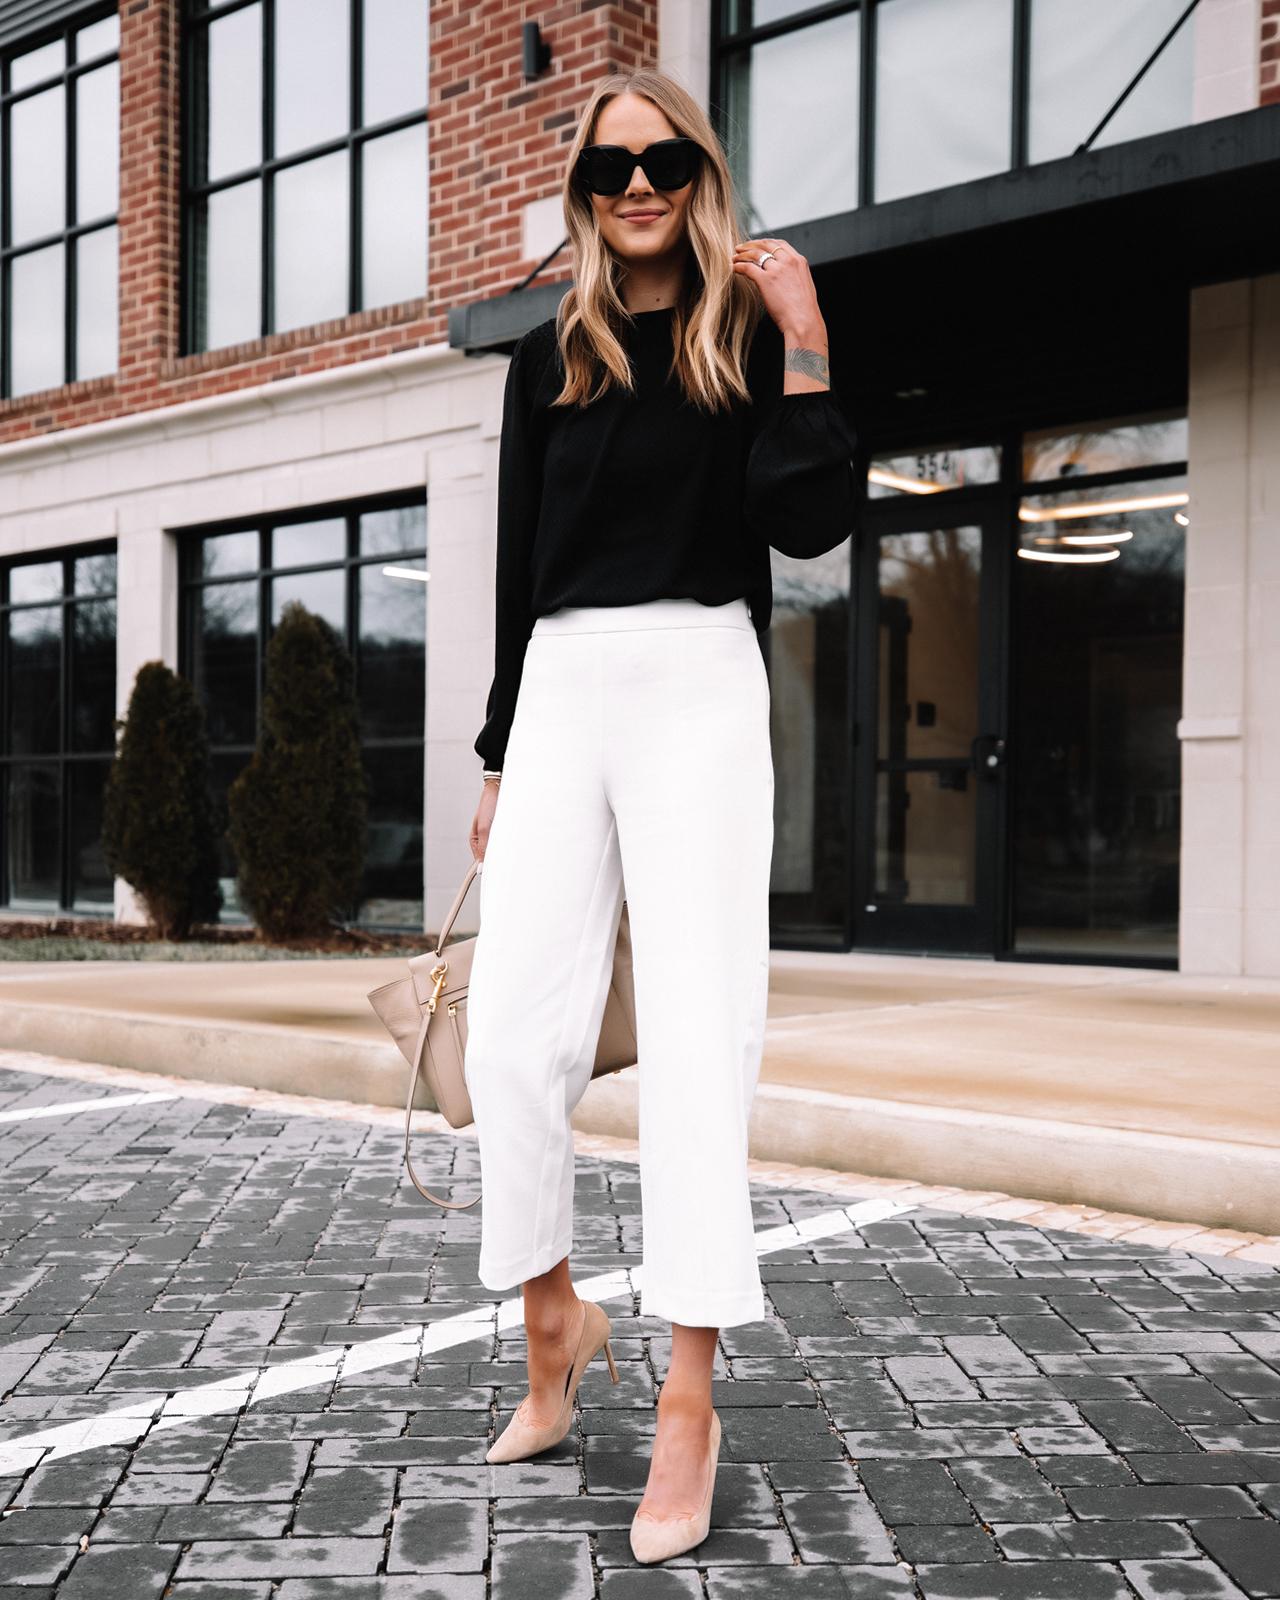 Fashion Jackson Wearing Ann Taylor White Pants Workwear Outfit